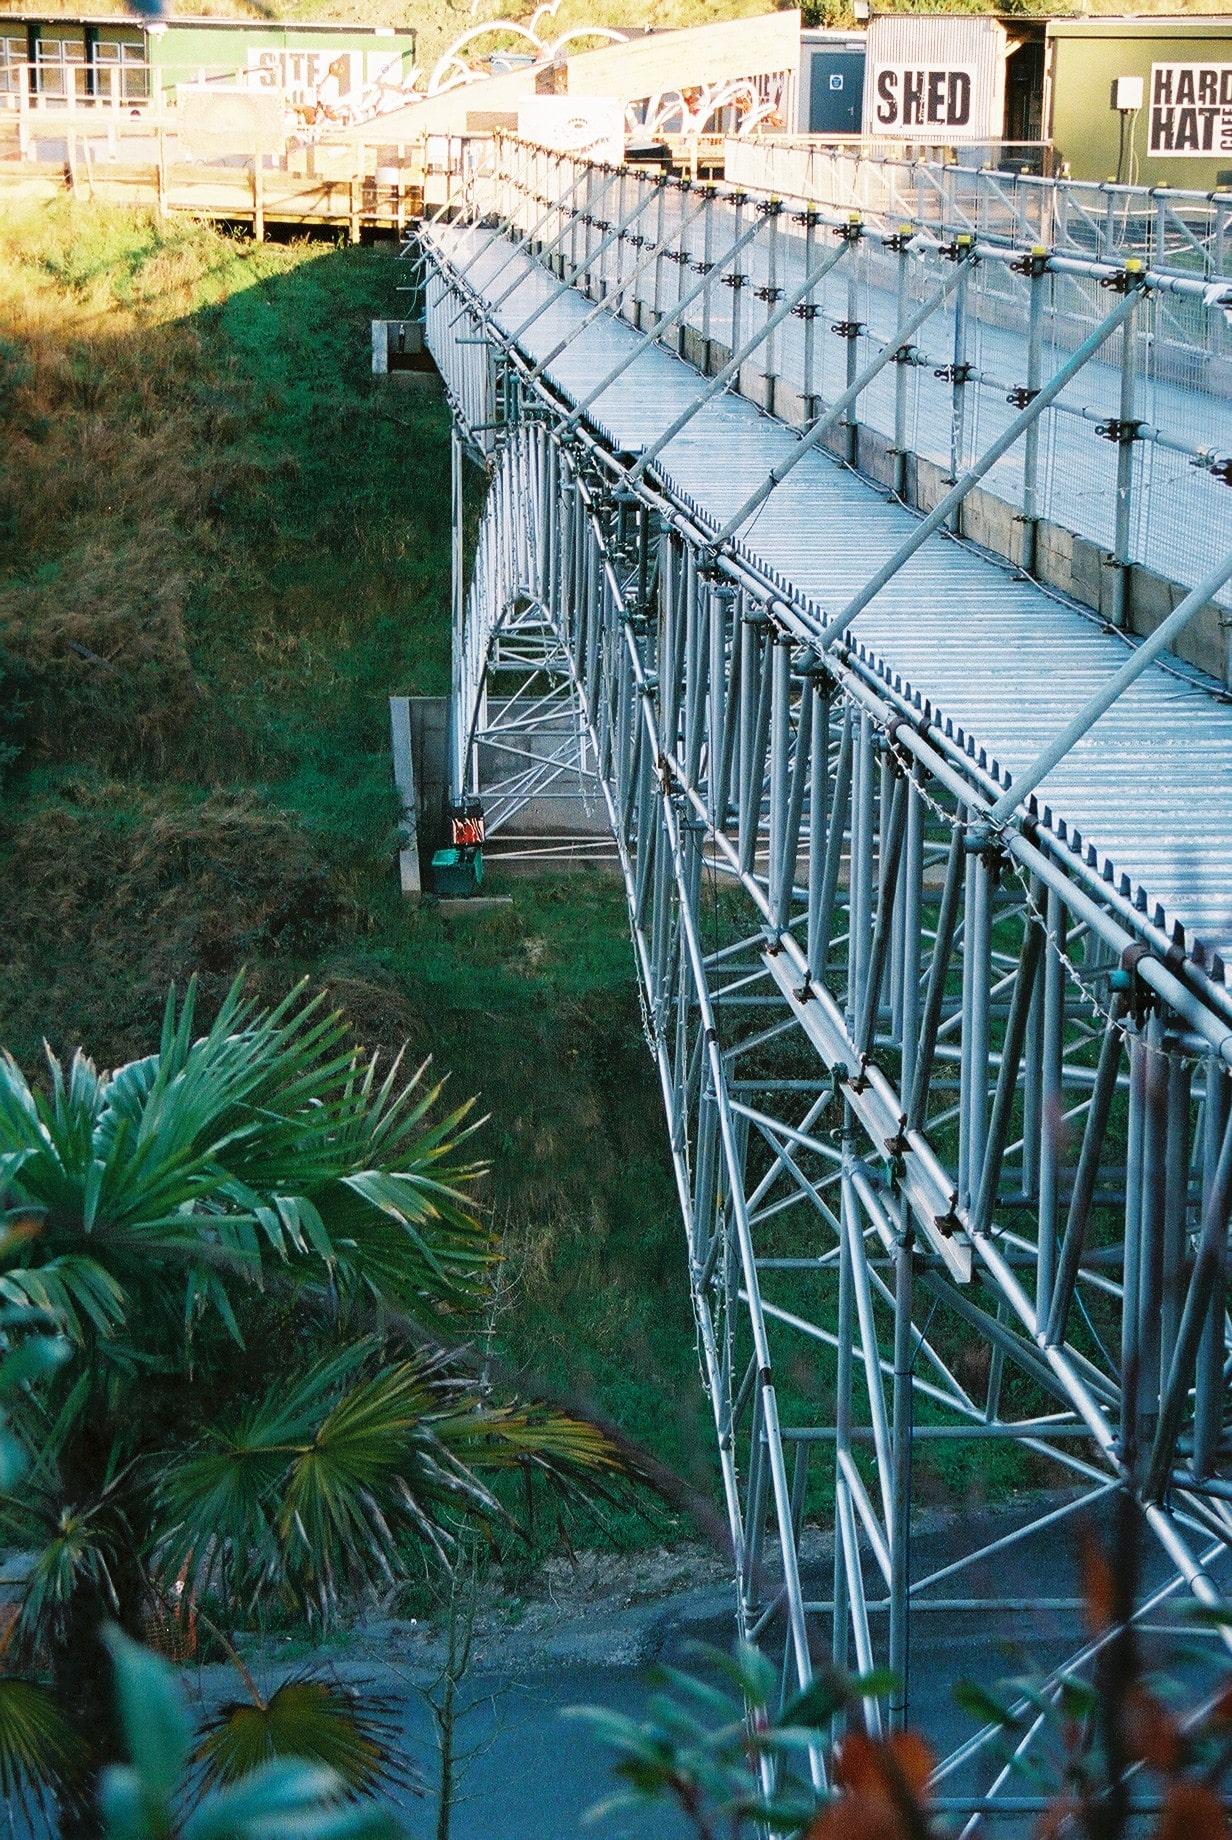 Temporary access bridge